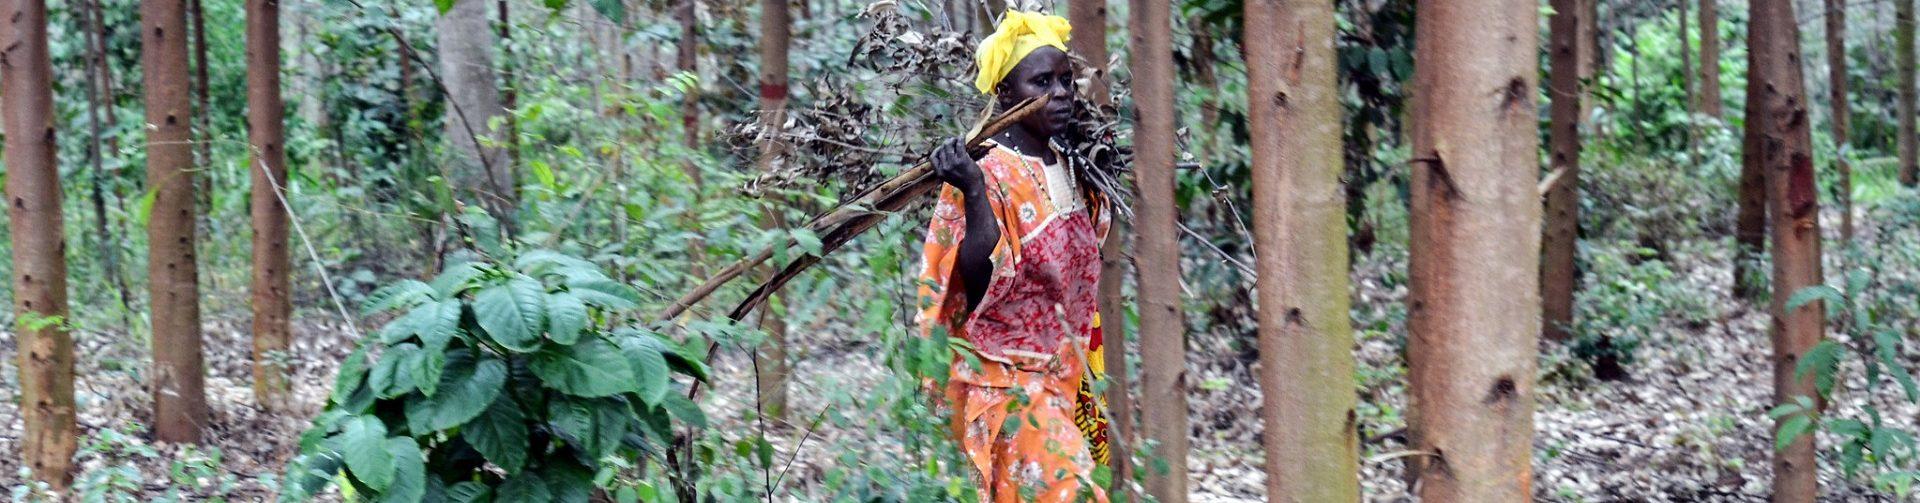 New CIFOR briefs analyze progress of forest tenure reforms in Uganda and Kenya